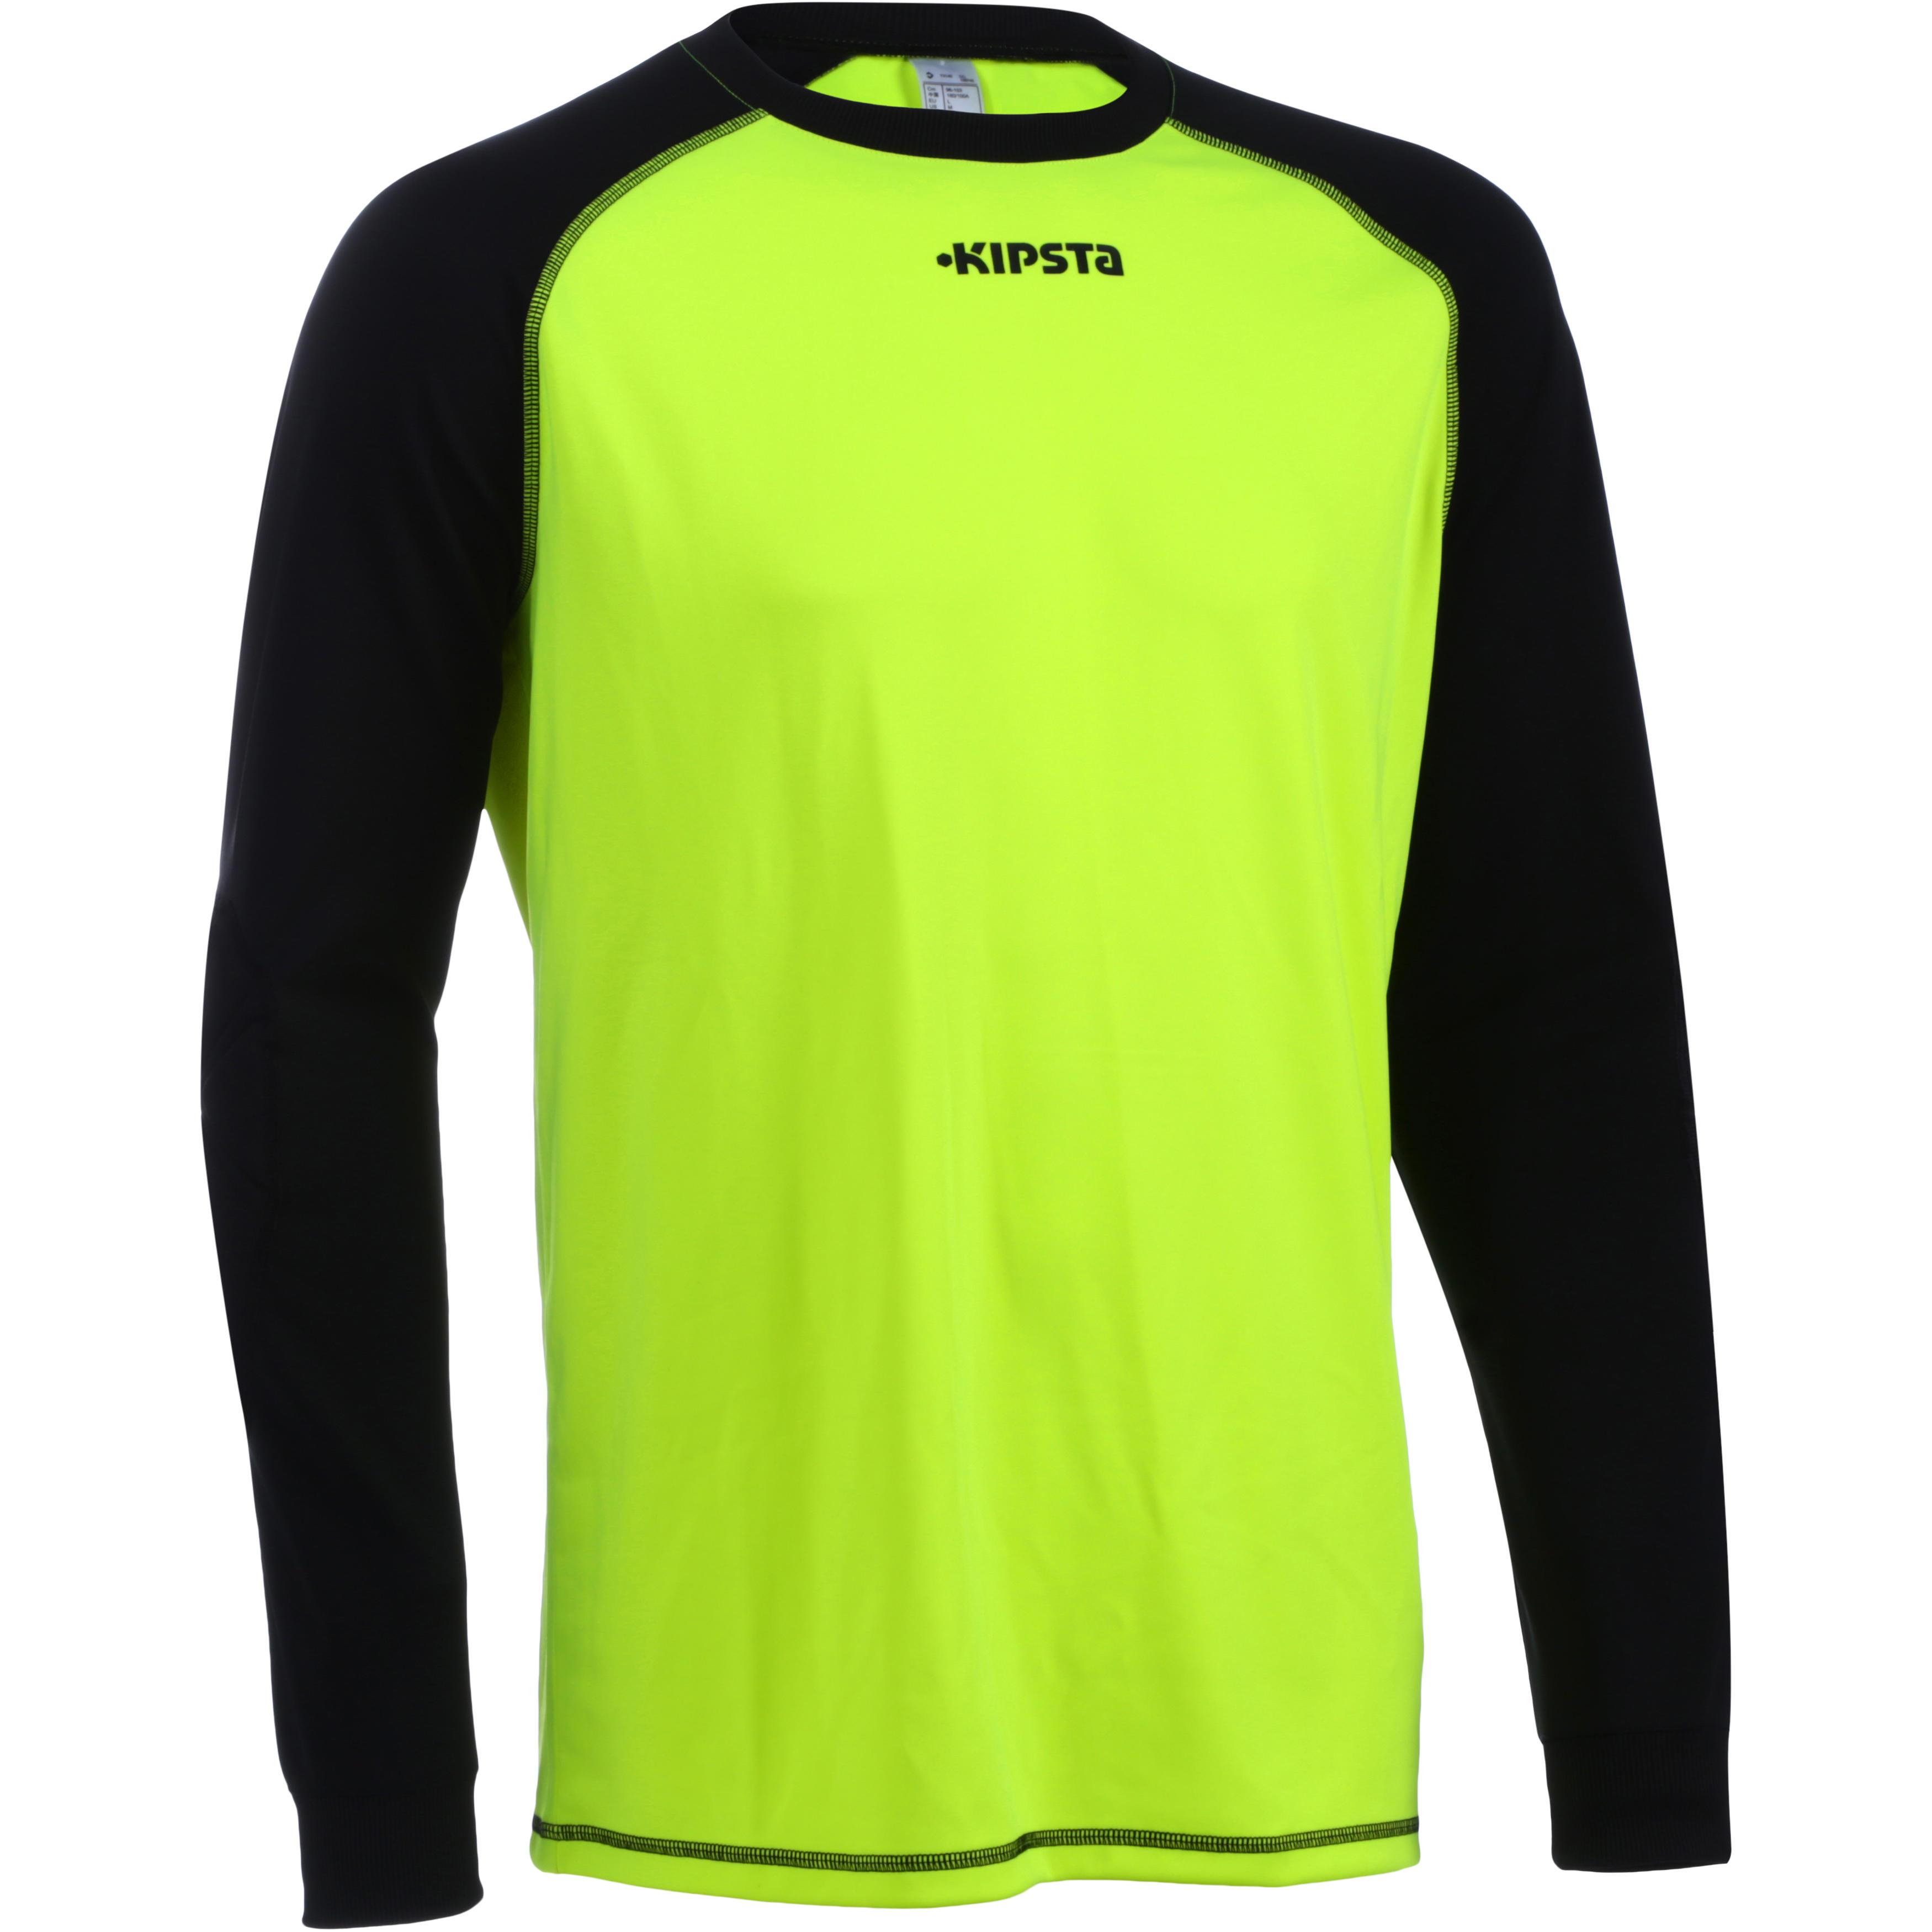 F300 Adult Football Goalkeeper Shirt Yellow Black